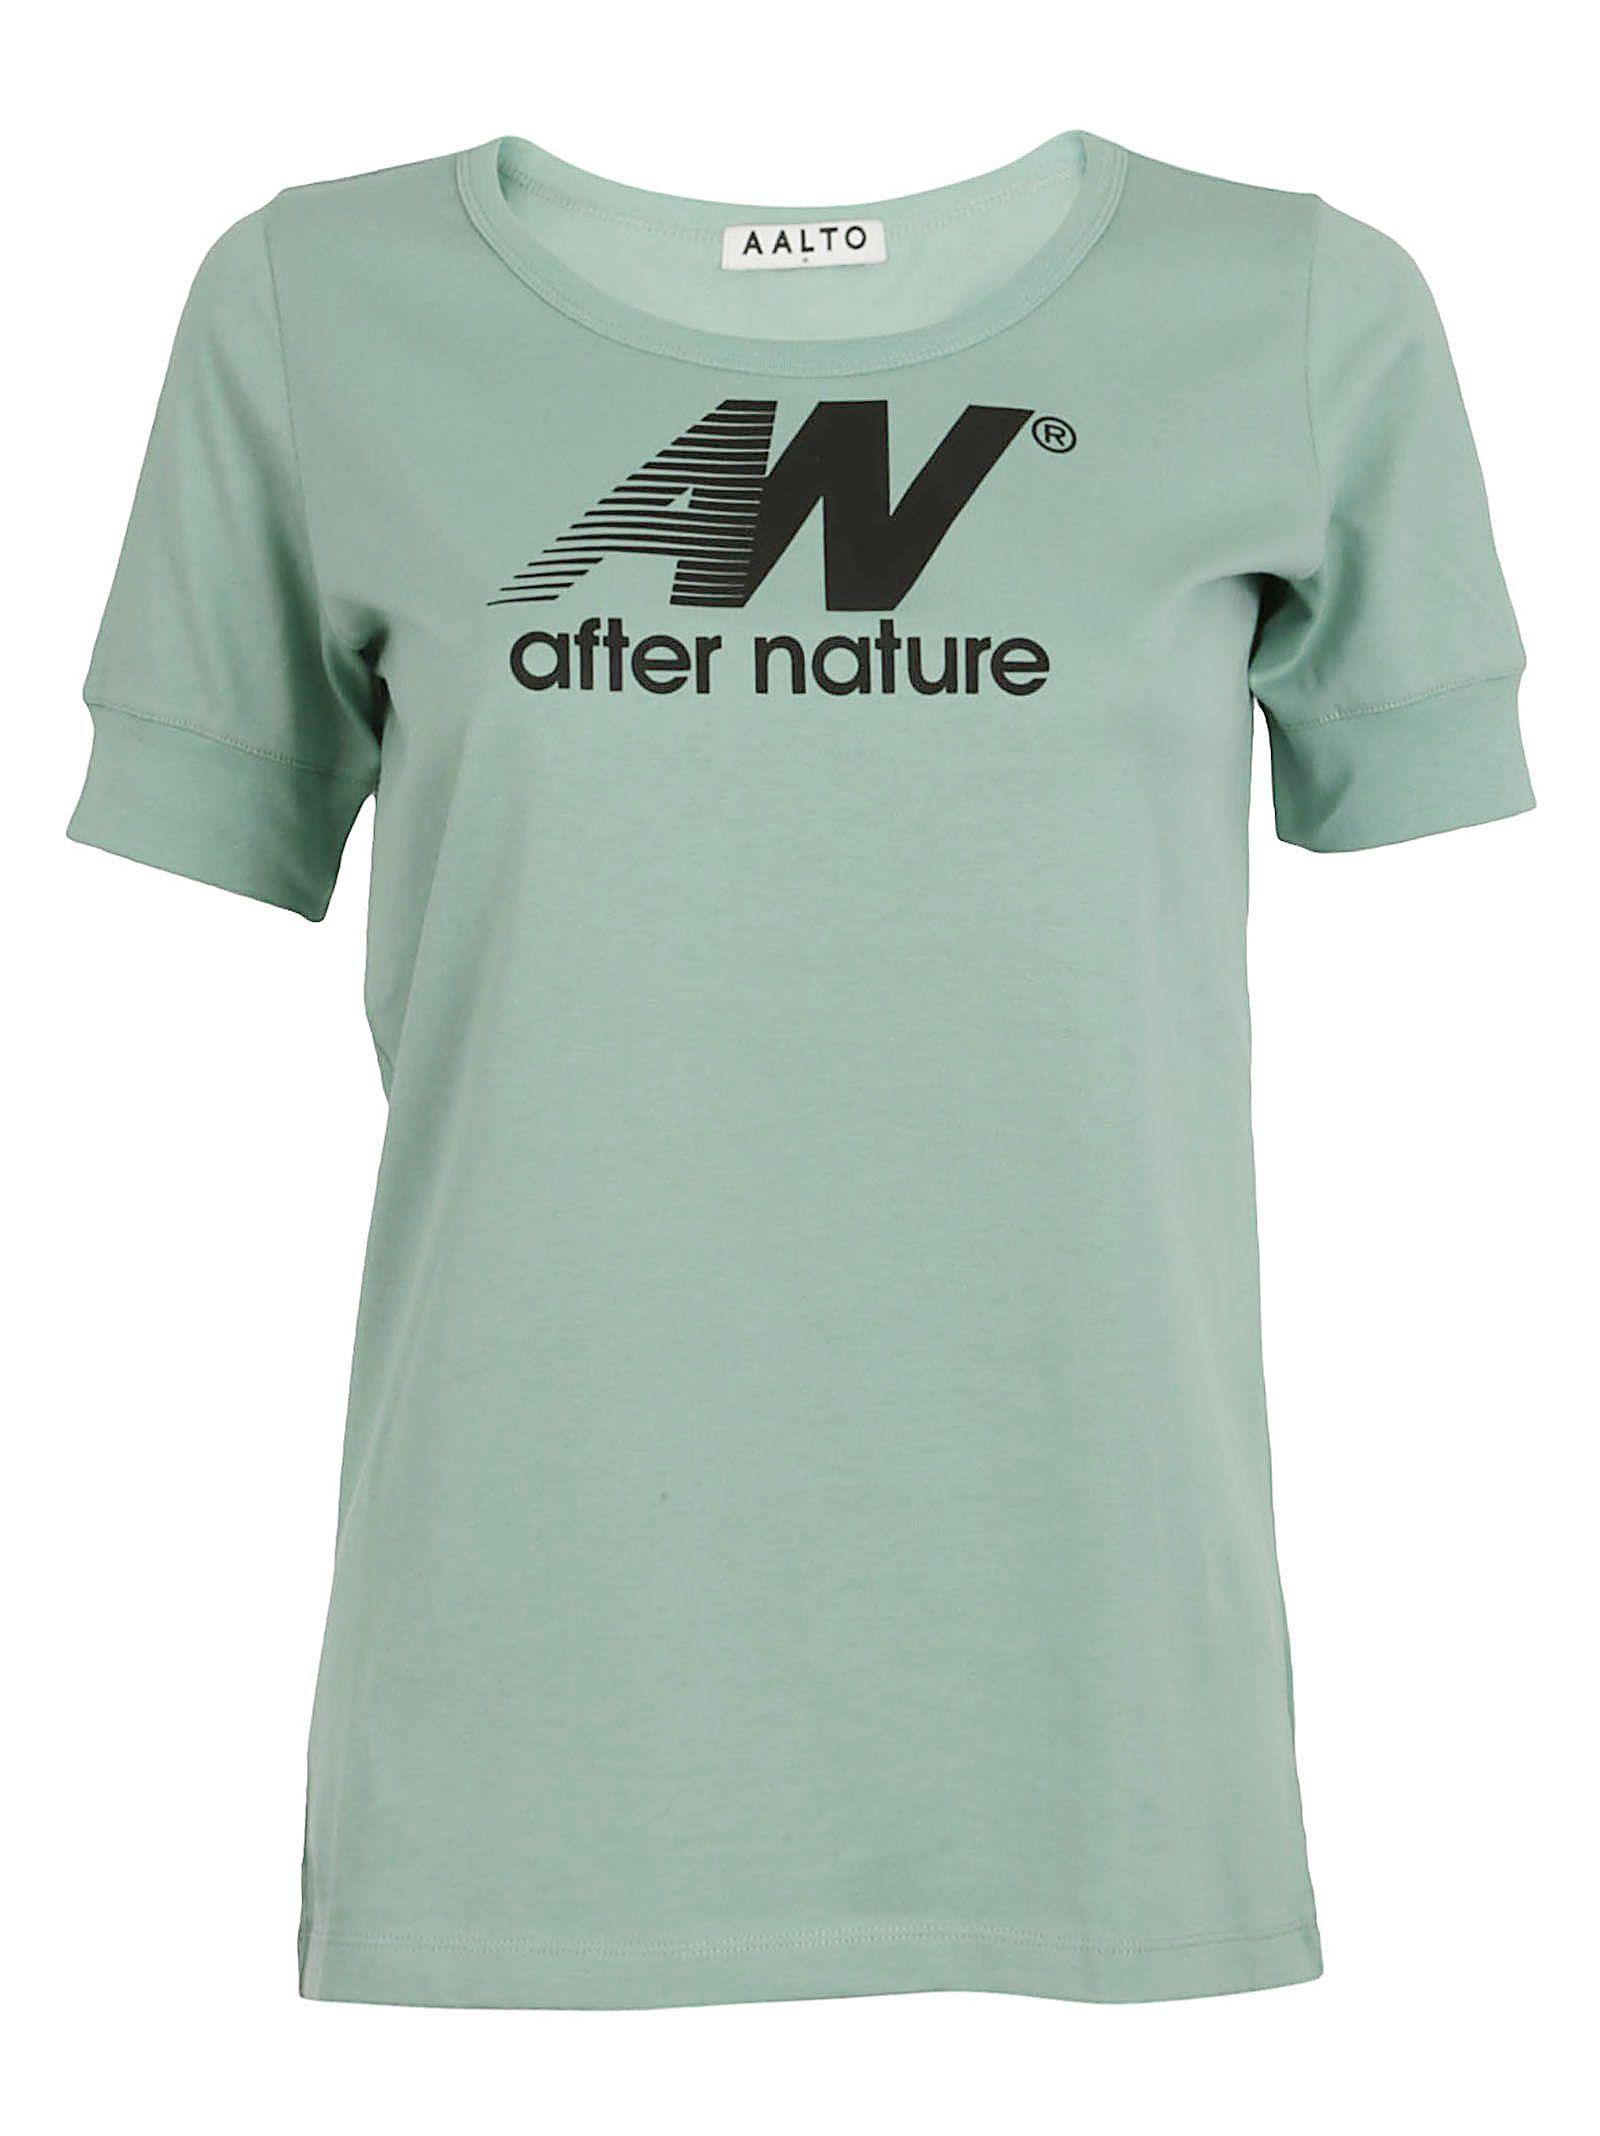 aalto female aalto after nature tshirt